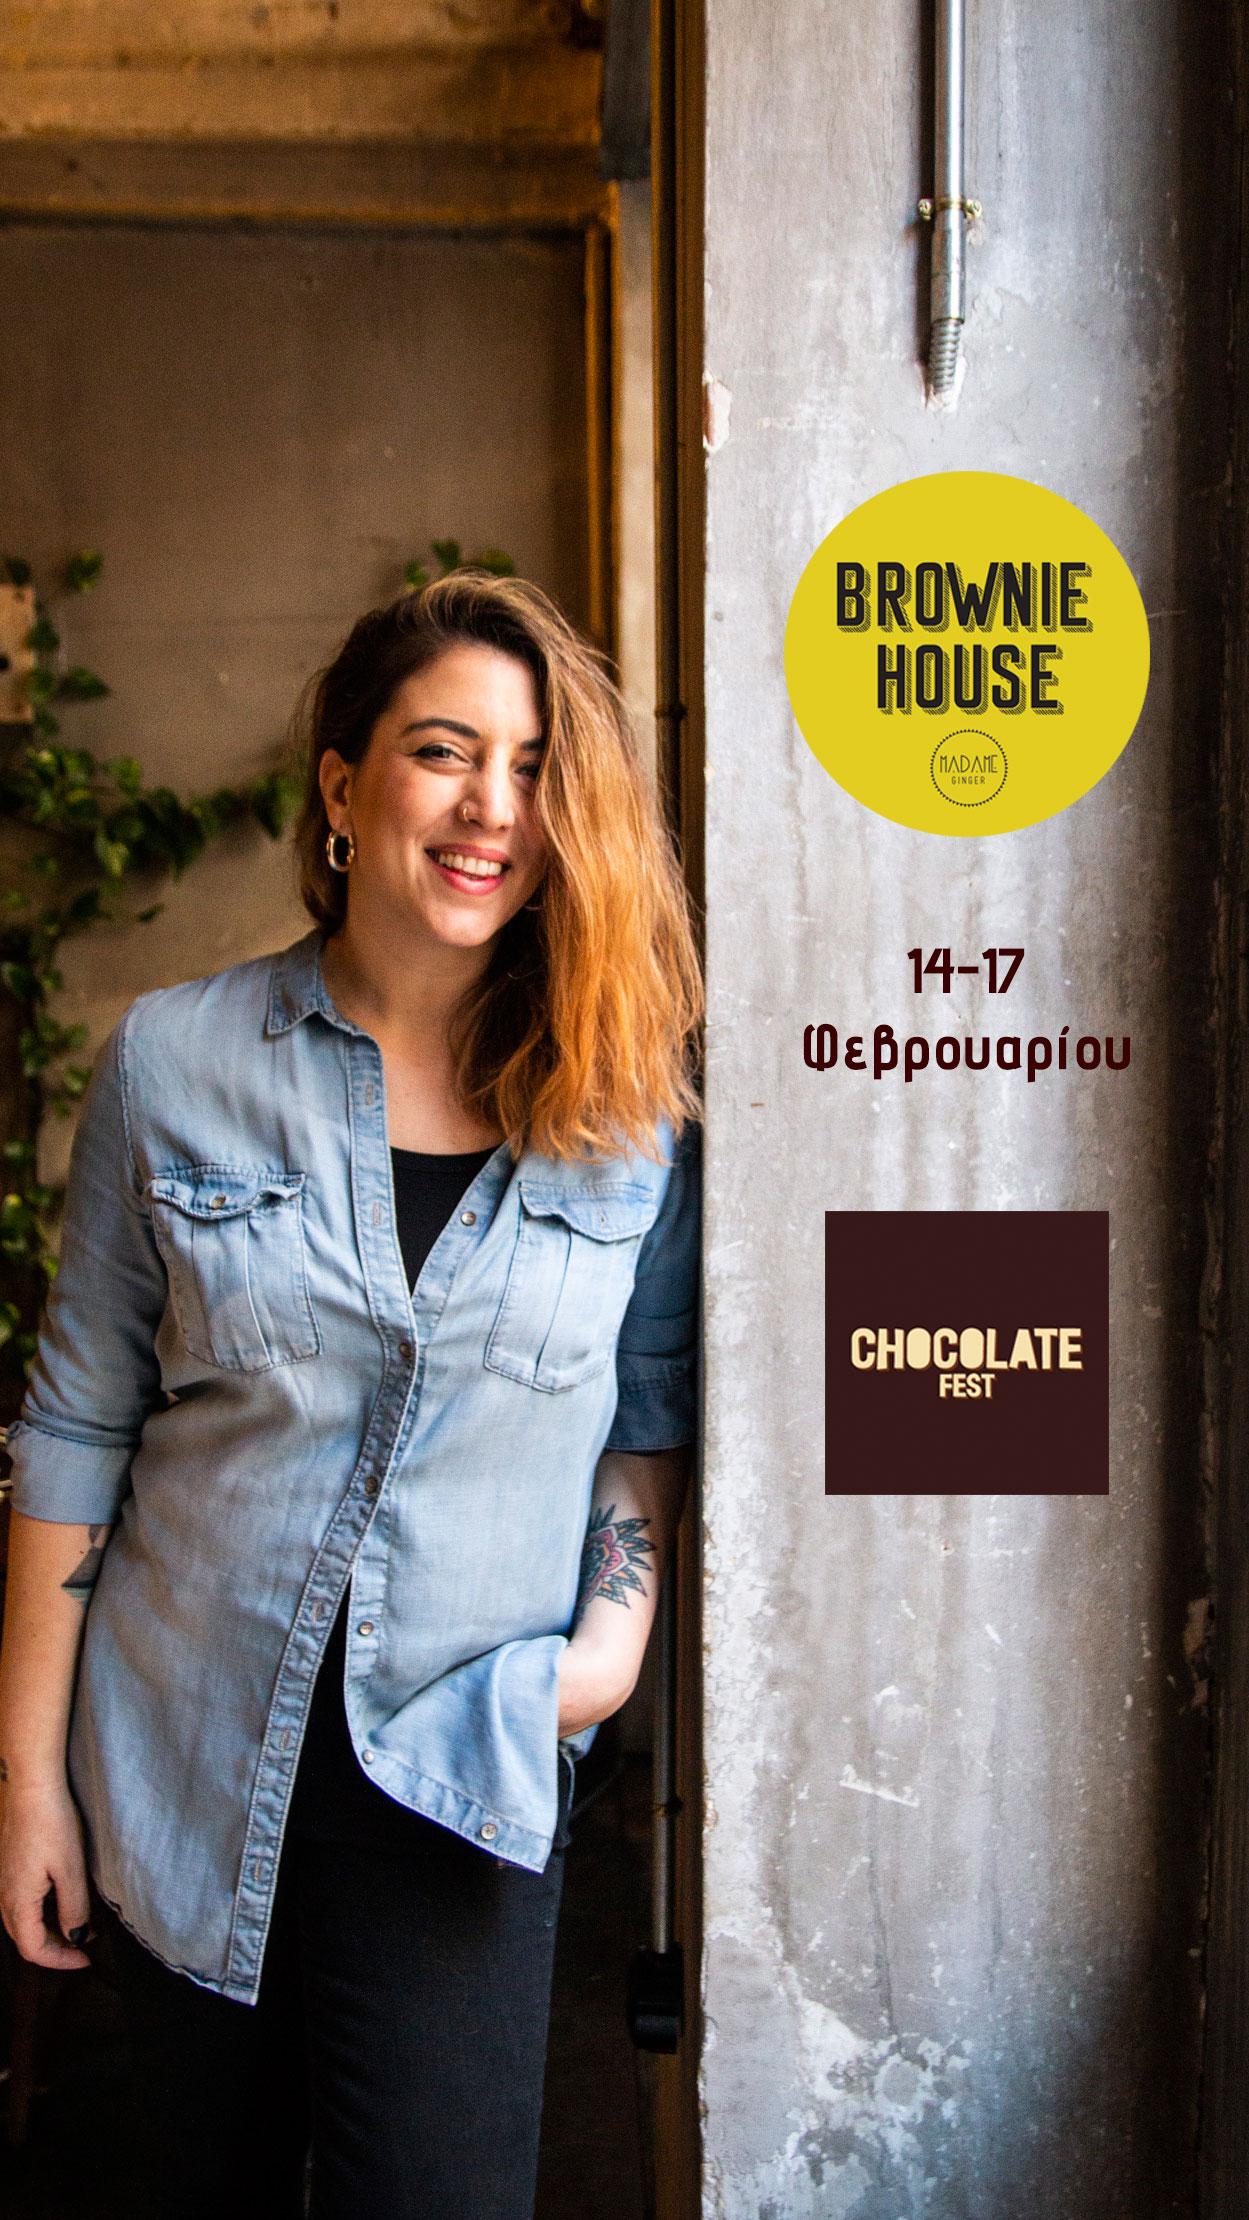 Brownie House - Madame Ginger - Insta Story.jpg